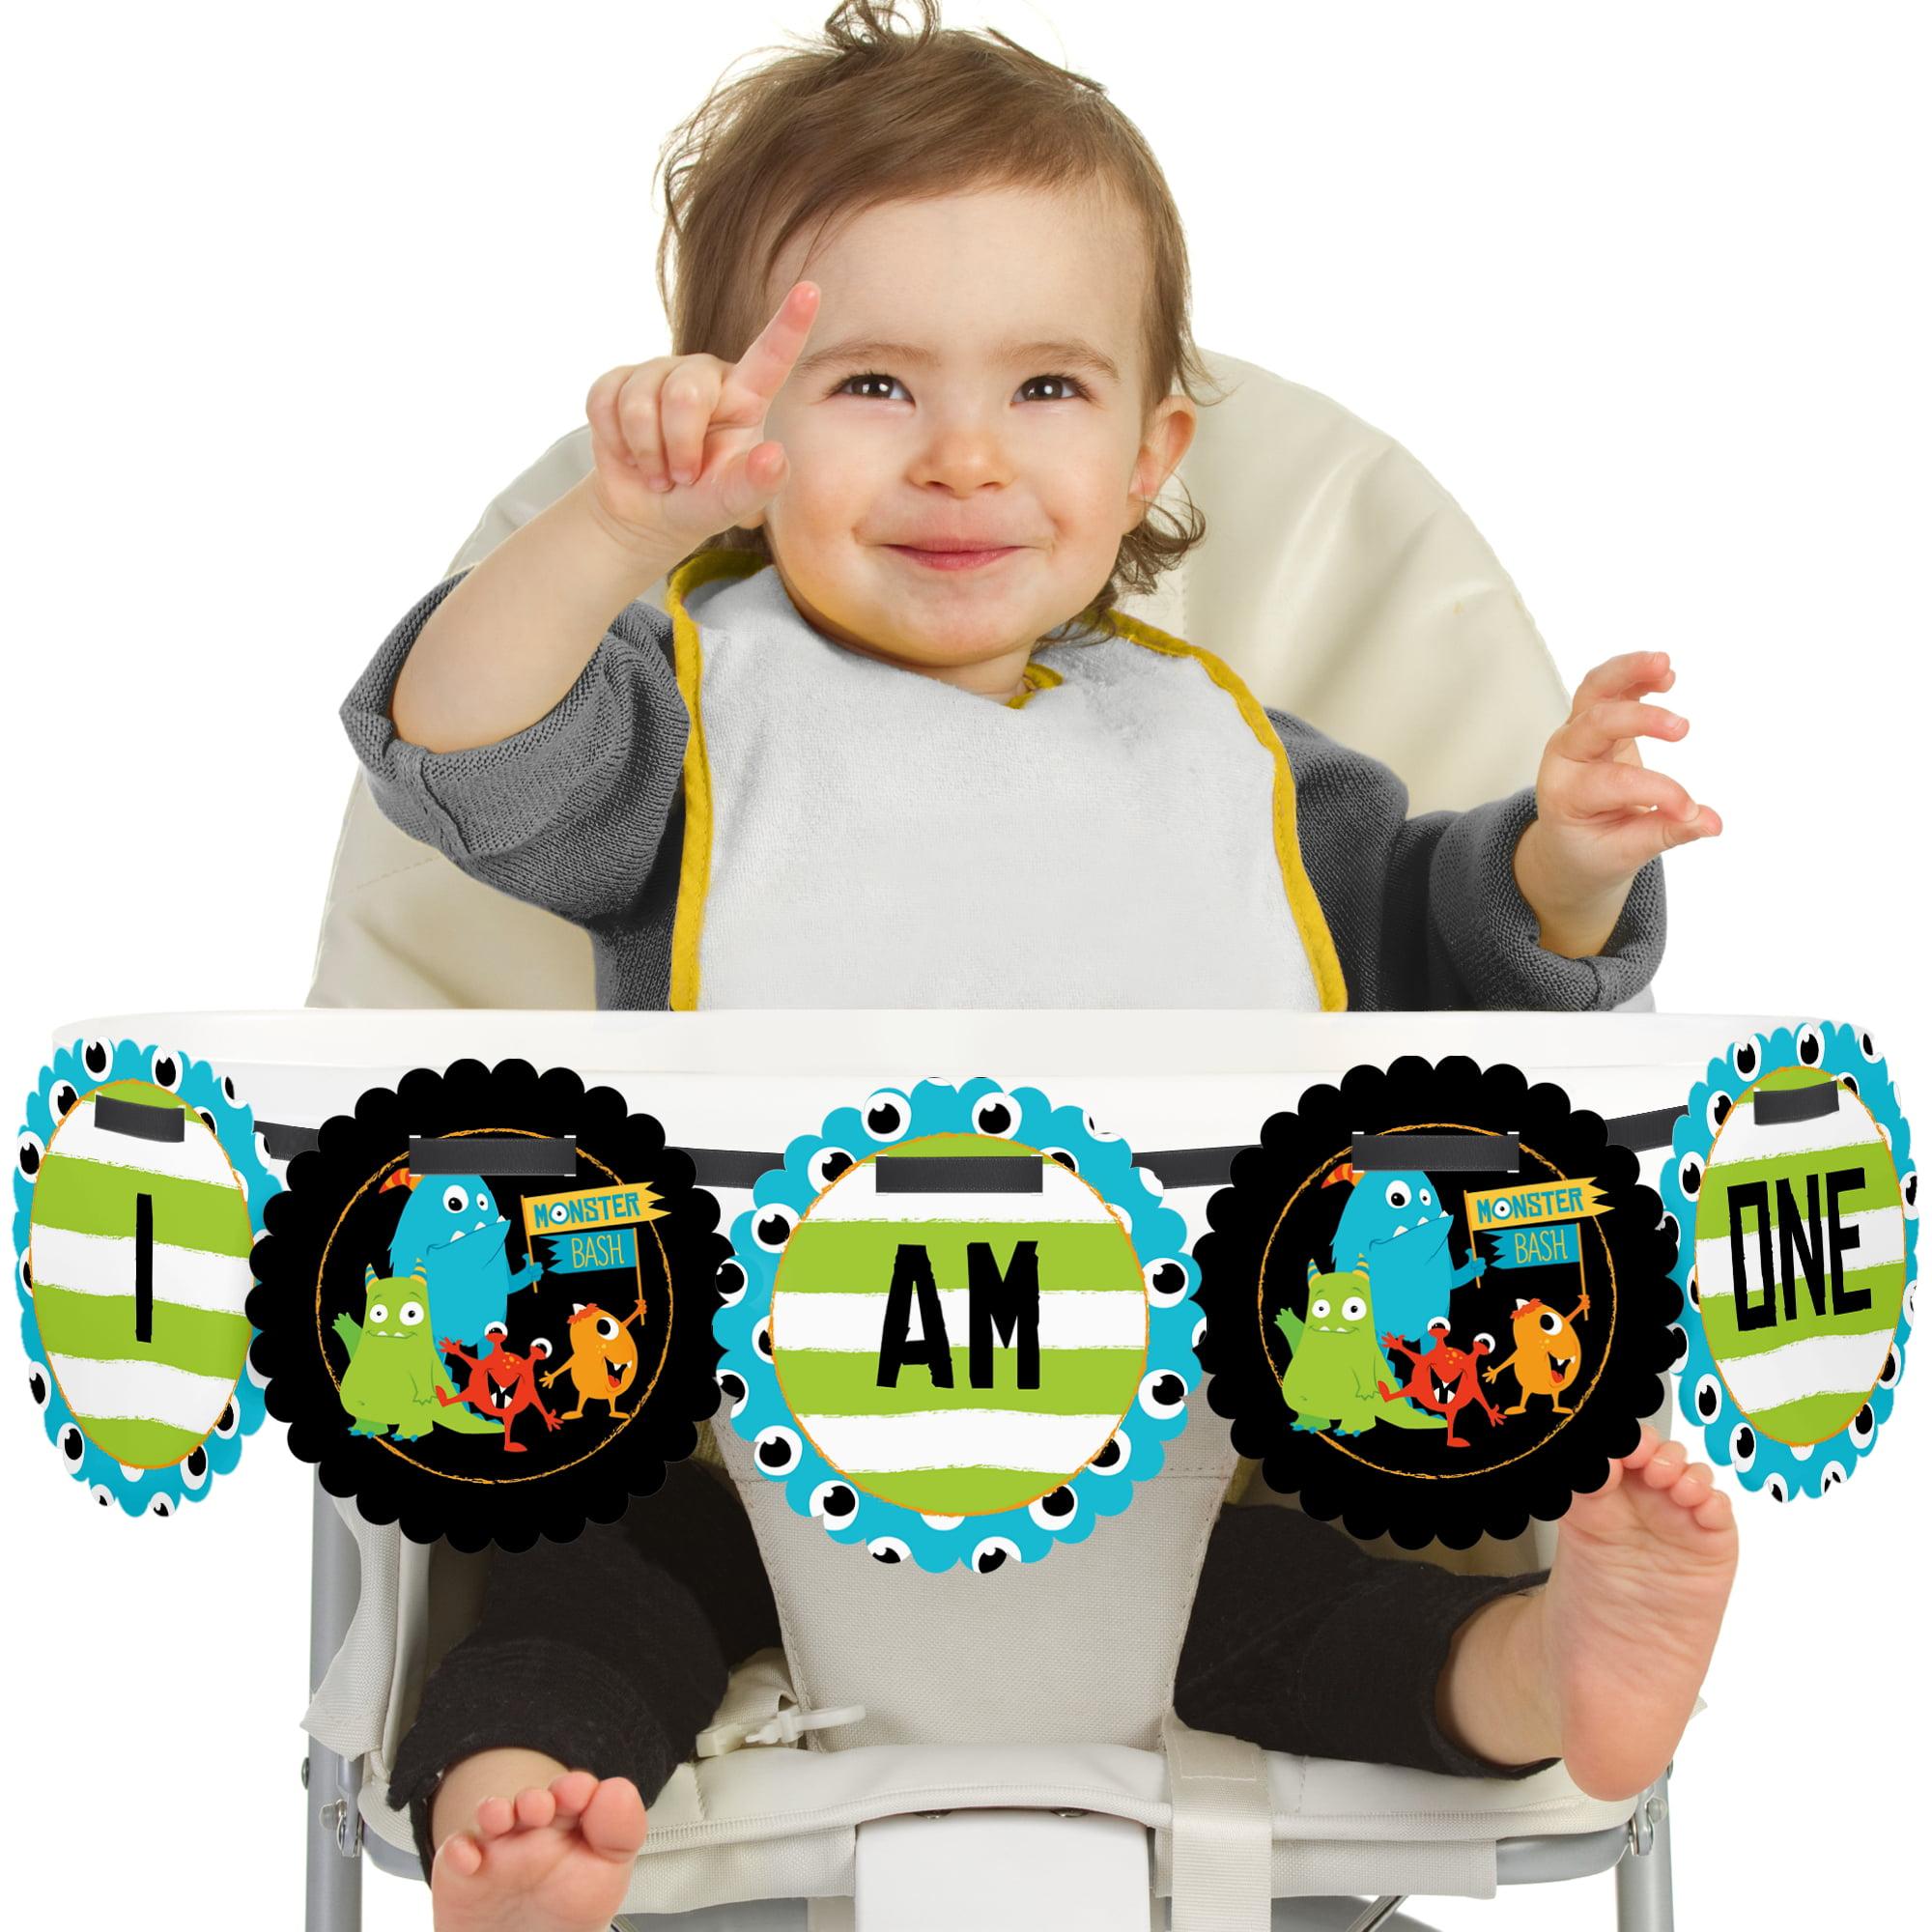 Monster Bash - I Am One - Little Monster First Birthday High Chair Birthday Banner